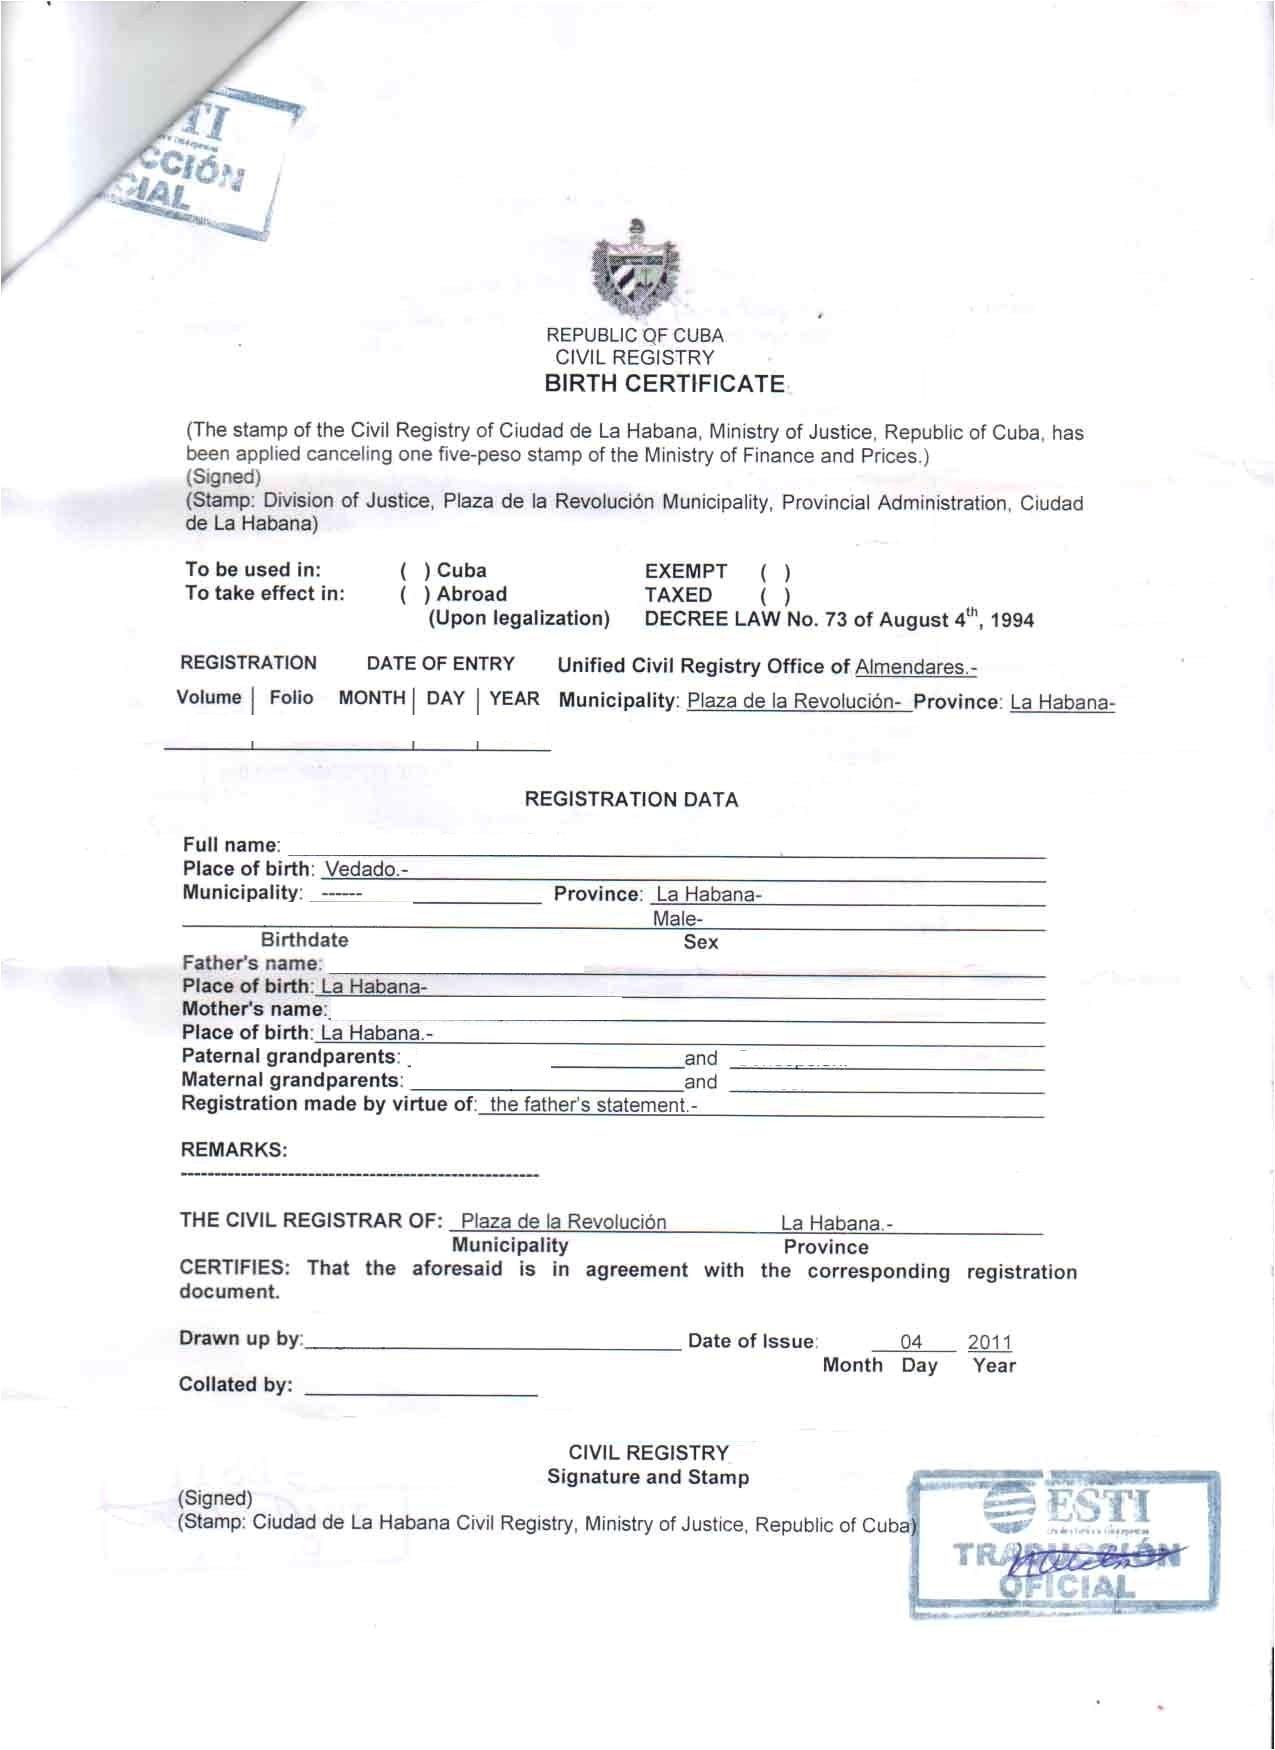 Death Certificate Translation Template Spanish to English Birth Certificate Translation Template English to Italian